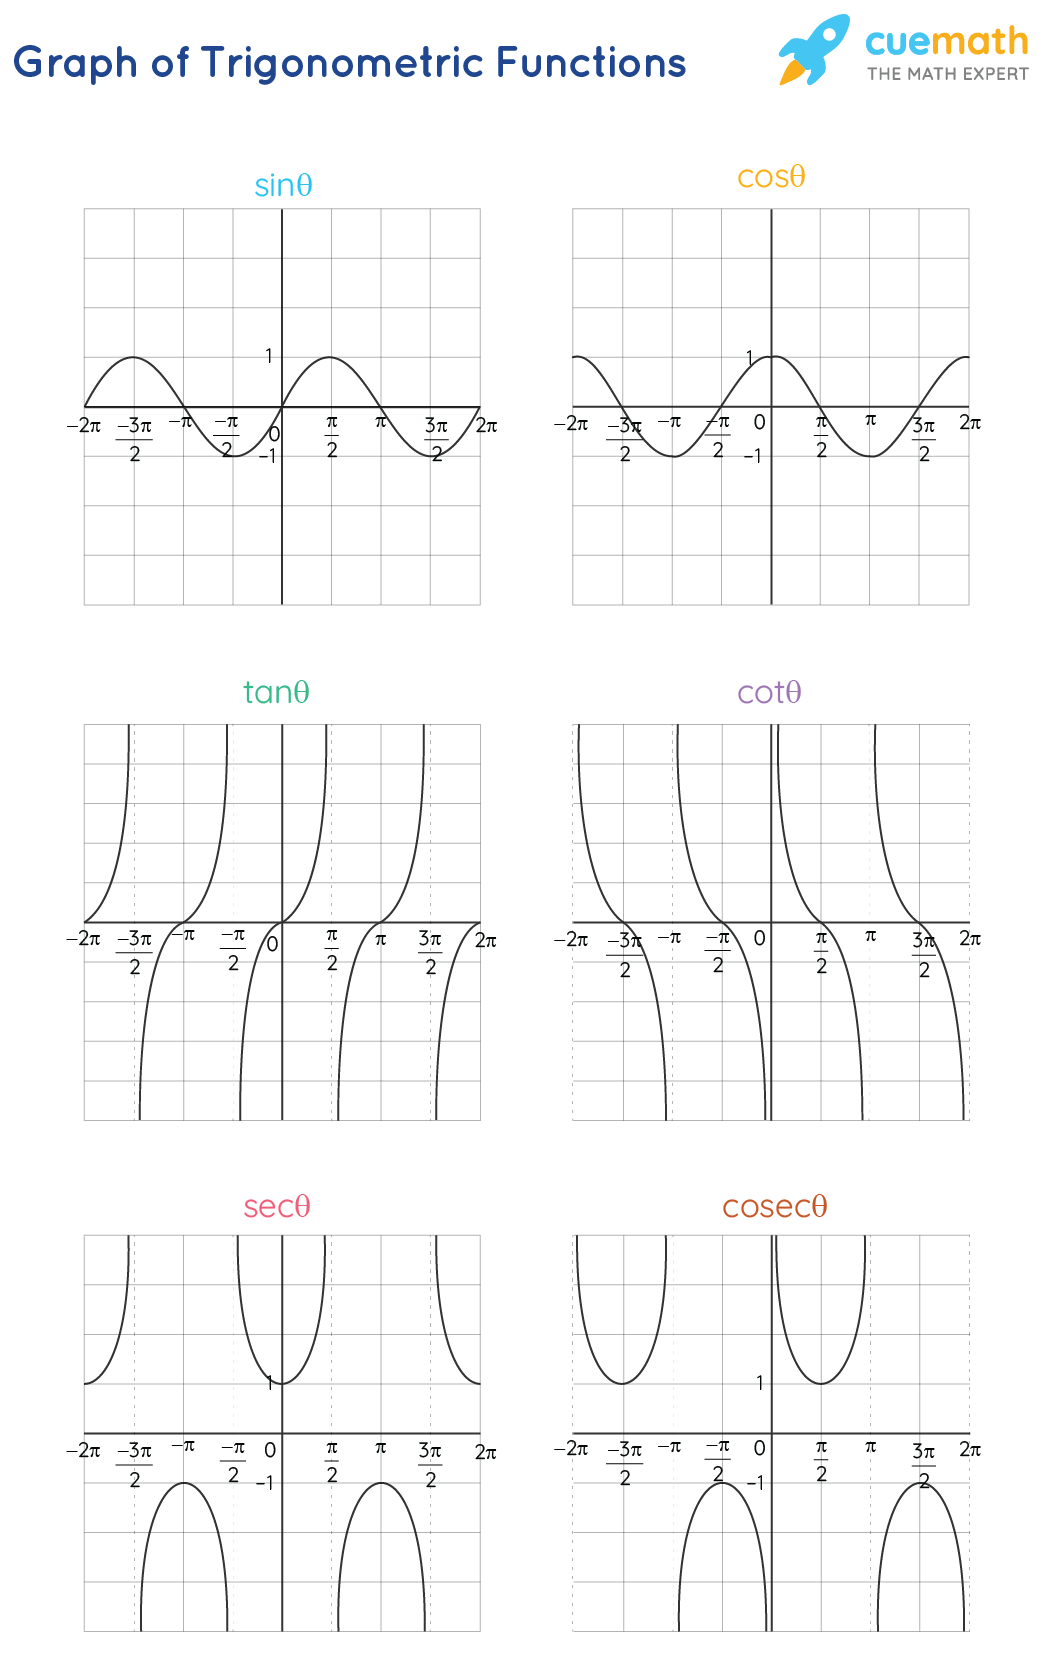 Graph of Trigonometric Functions